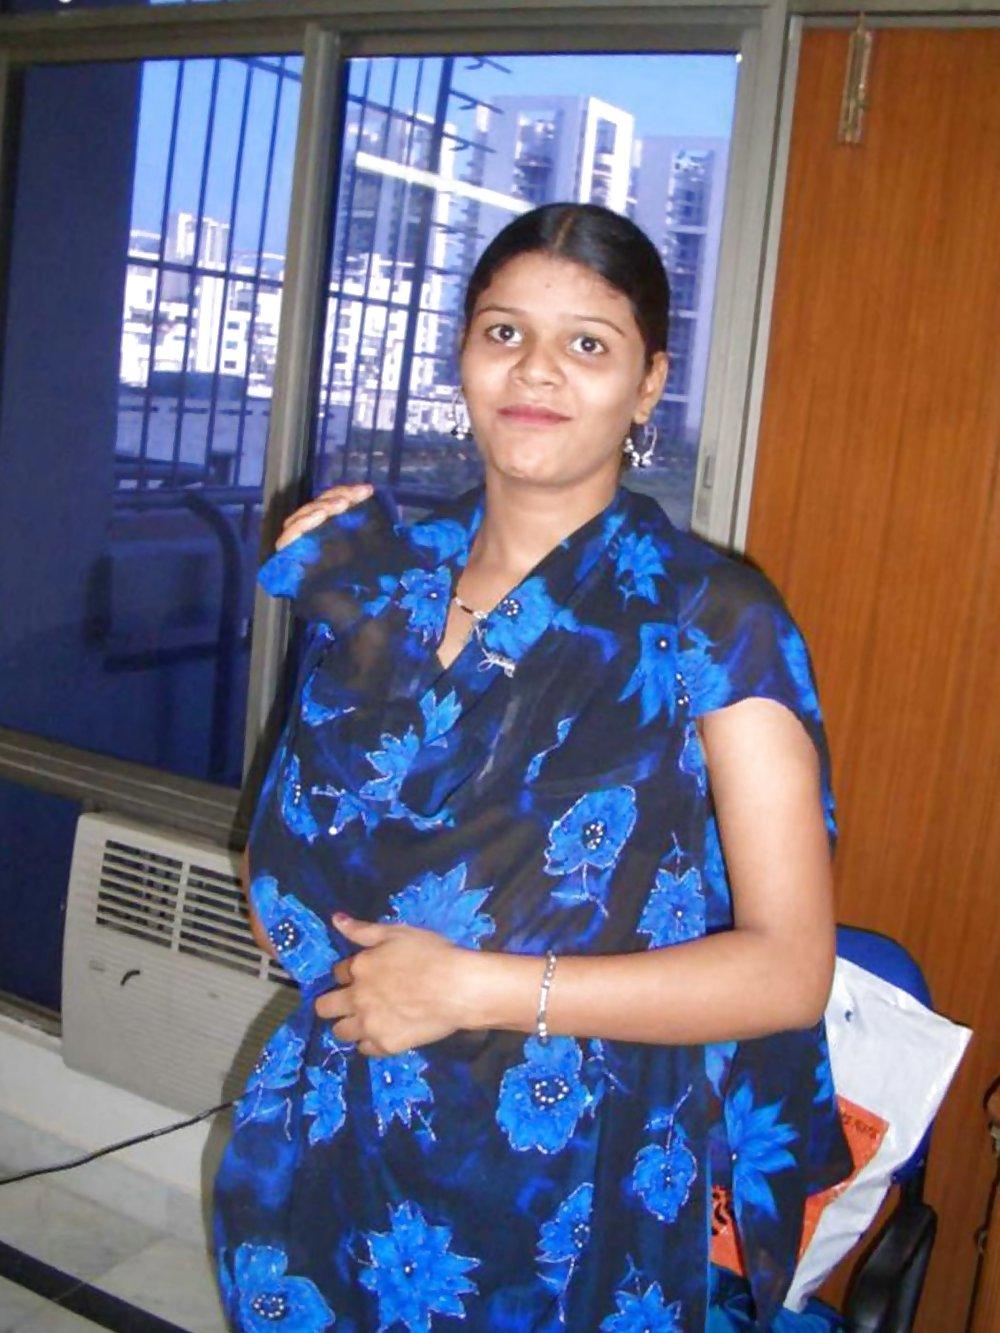 Desi randi sex photos think, that you